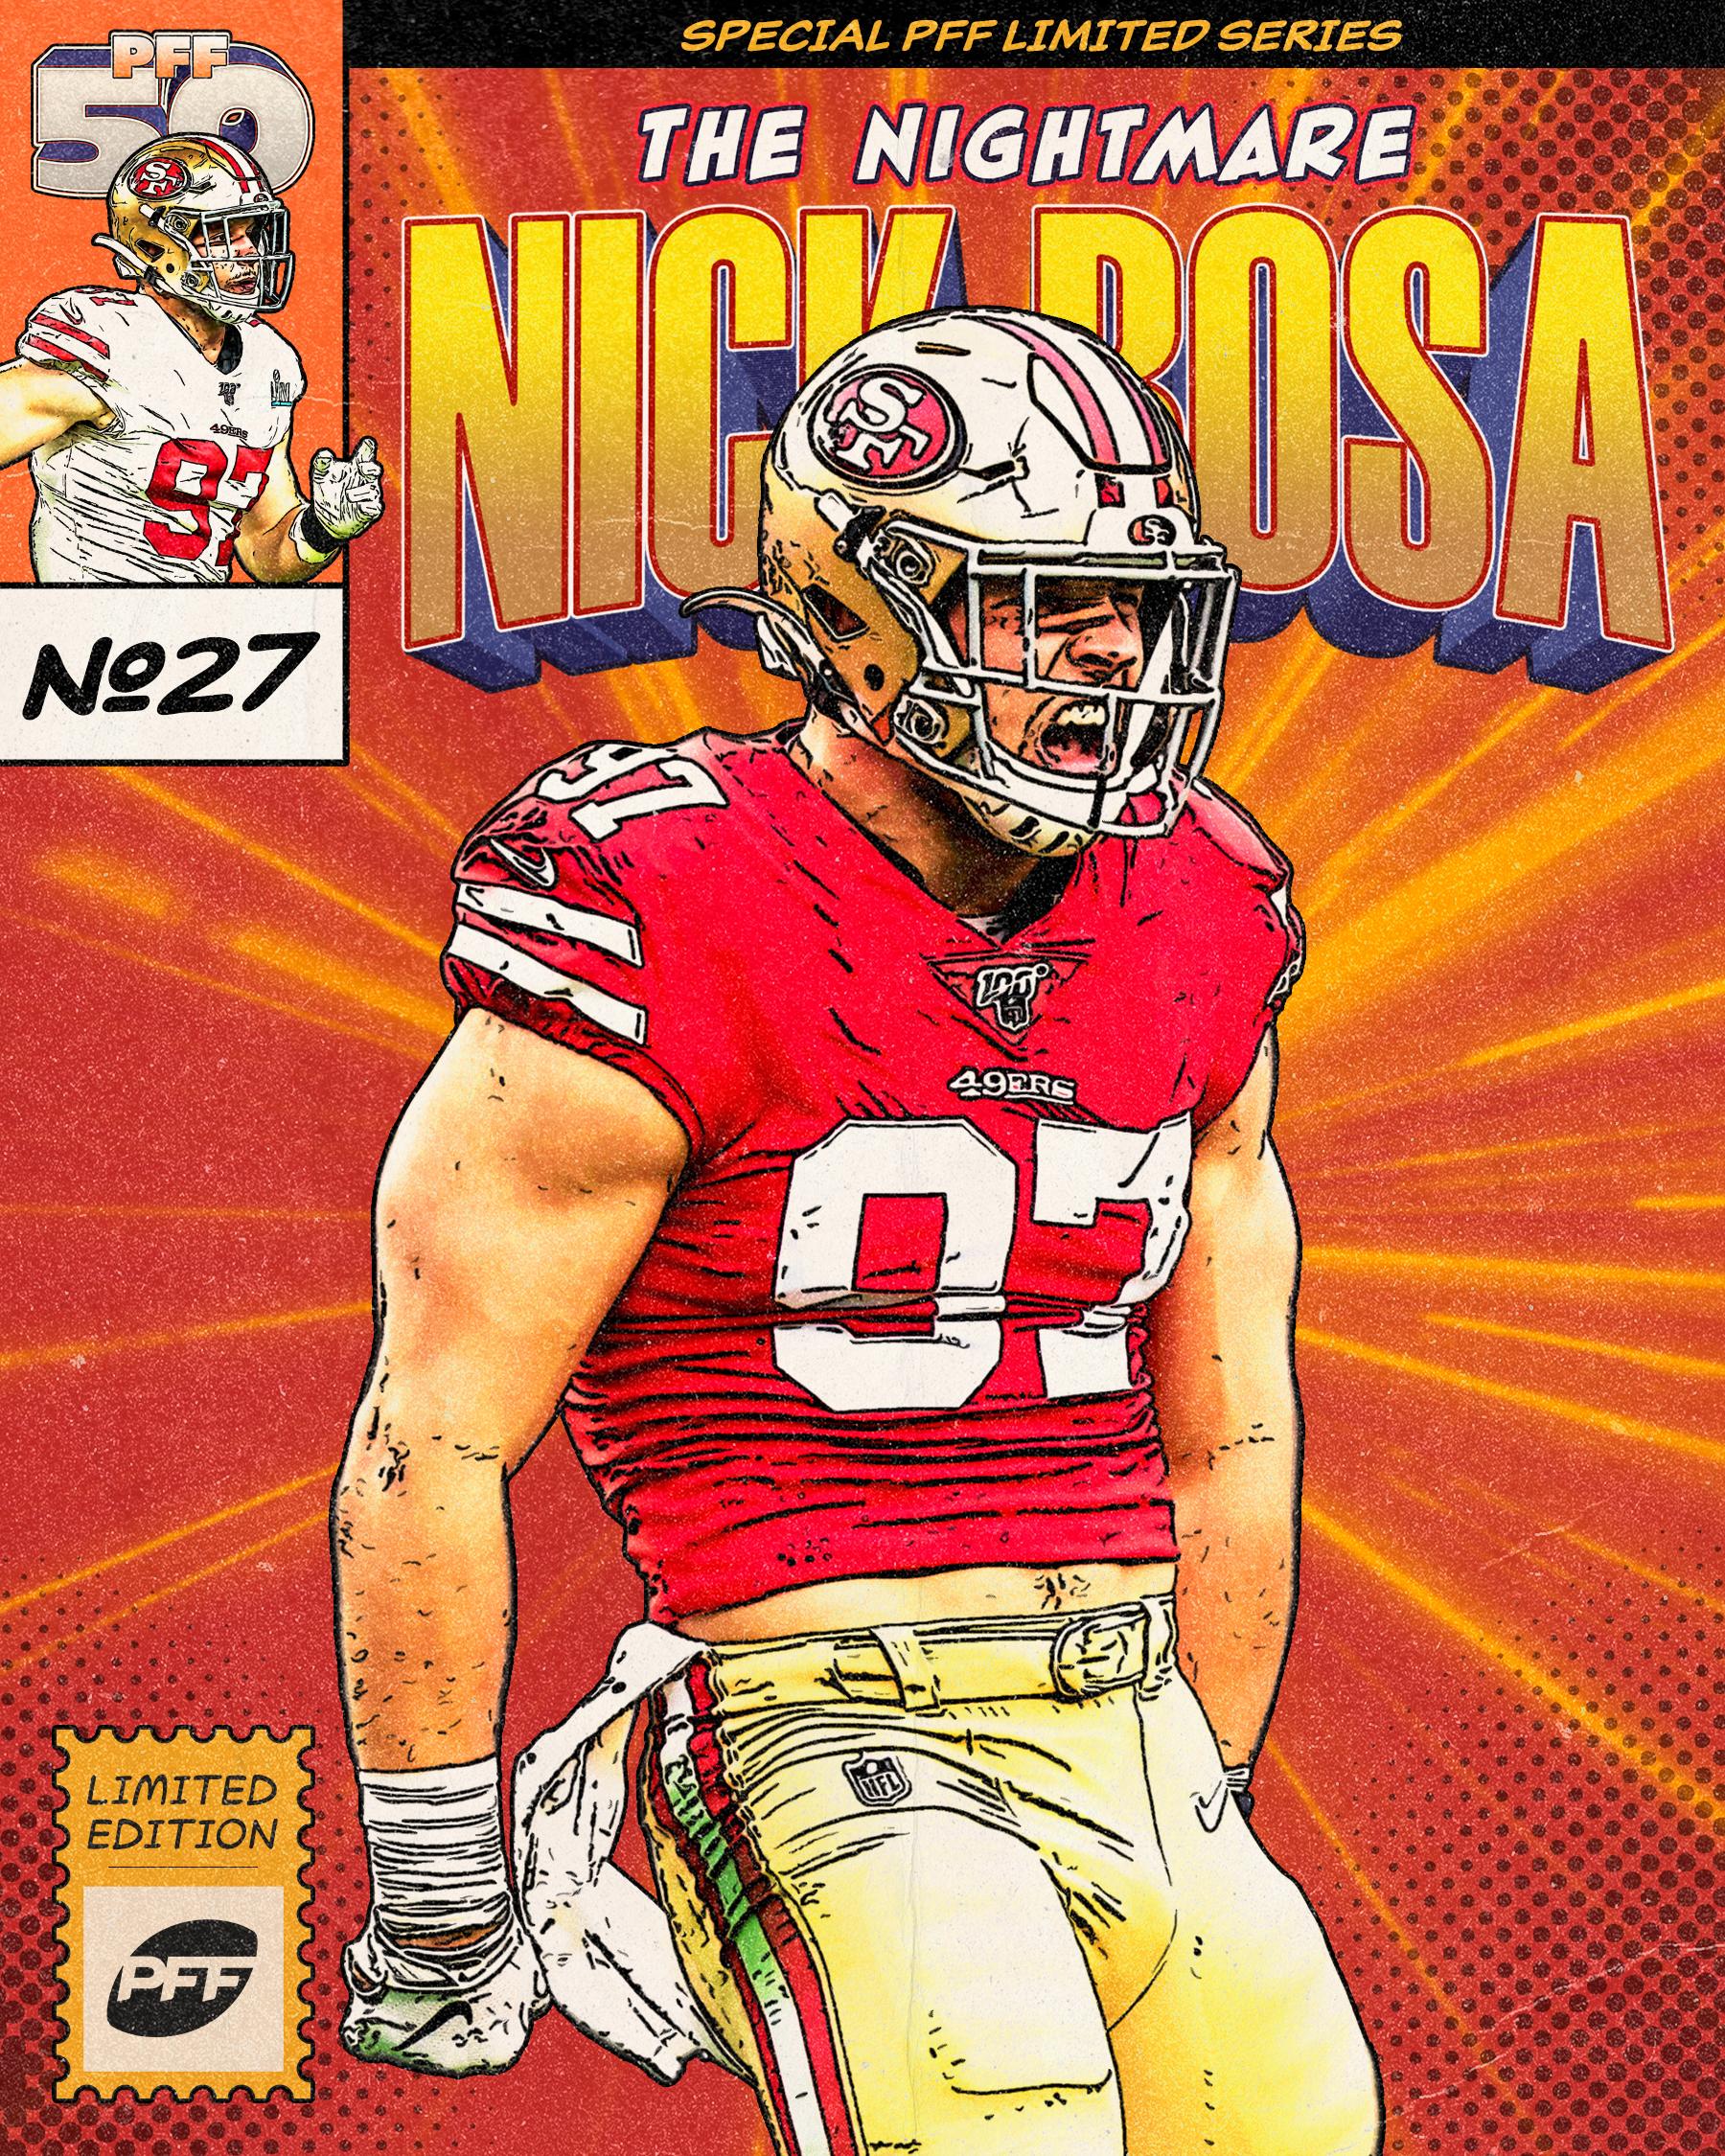 San Francisco 49ers EDGE Nick Bosa